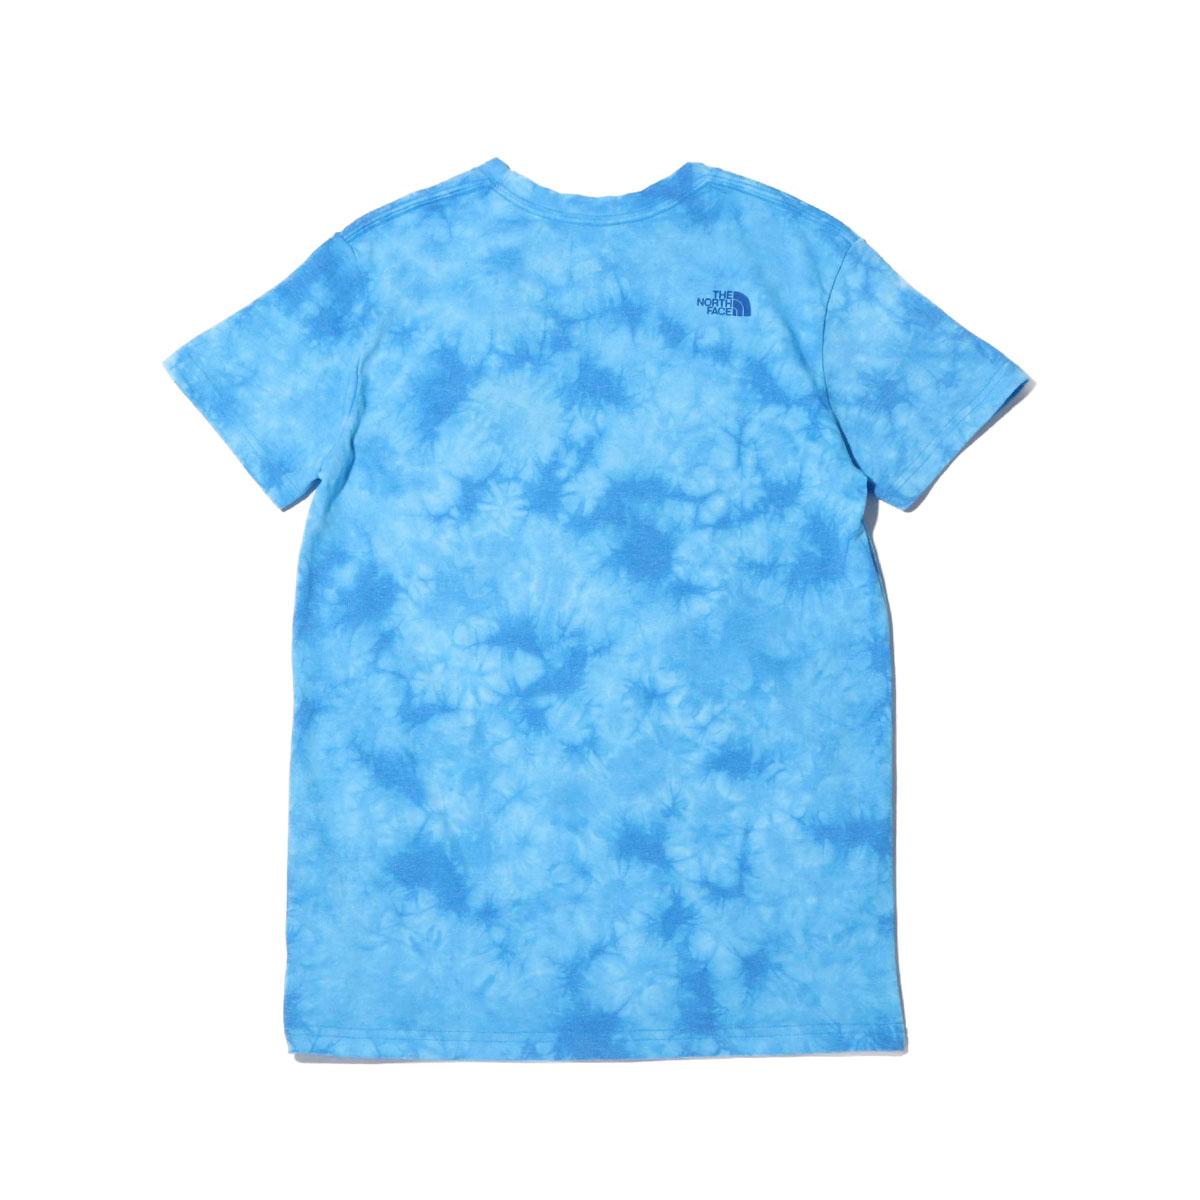 THE NORTH FACE S S TIE DYE TEE ザ・ノース・フェイス ショートスリーブ タイダイ ティー CLEAR LAKE BLUE レディース 半袖Tシャツ 20SS I354AcLSRjq